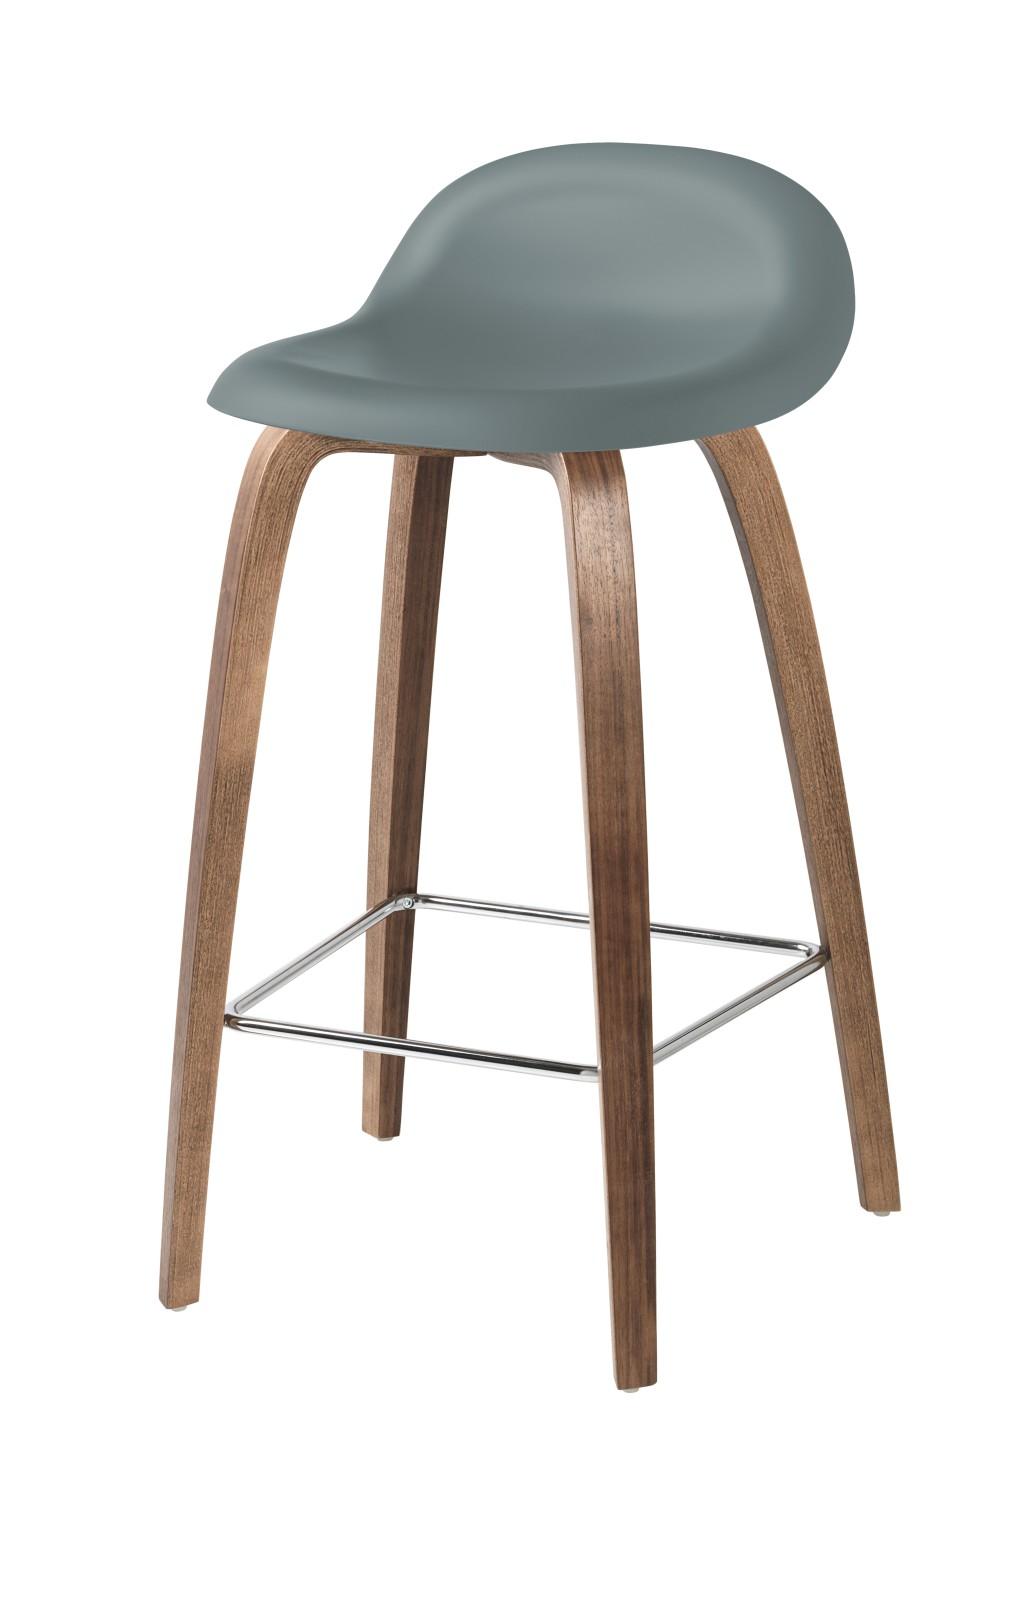 Gubi 3D Wood Base Counter Stool - Unupholstered Gubi HiRek Rainy Grey, Gubi Wood American Walnut